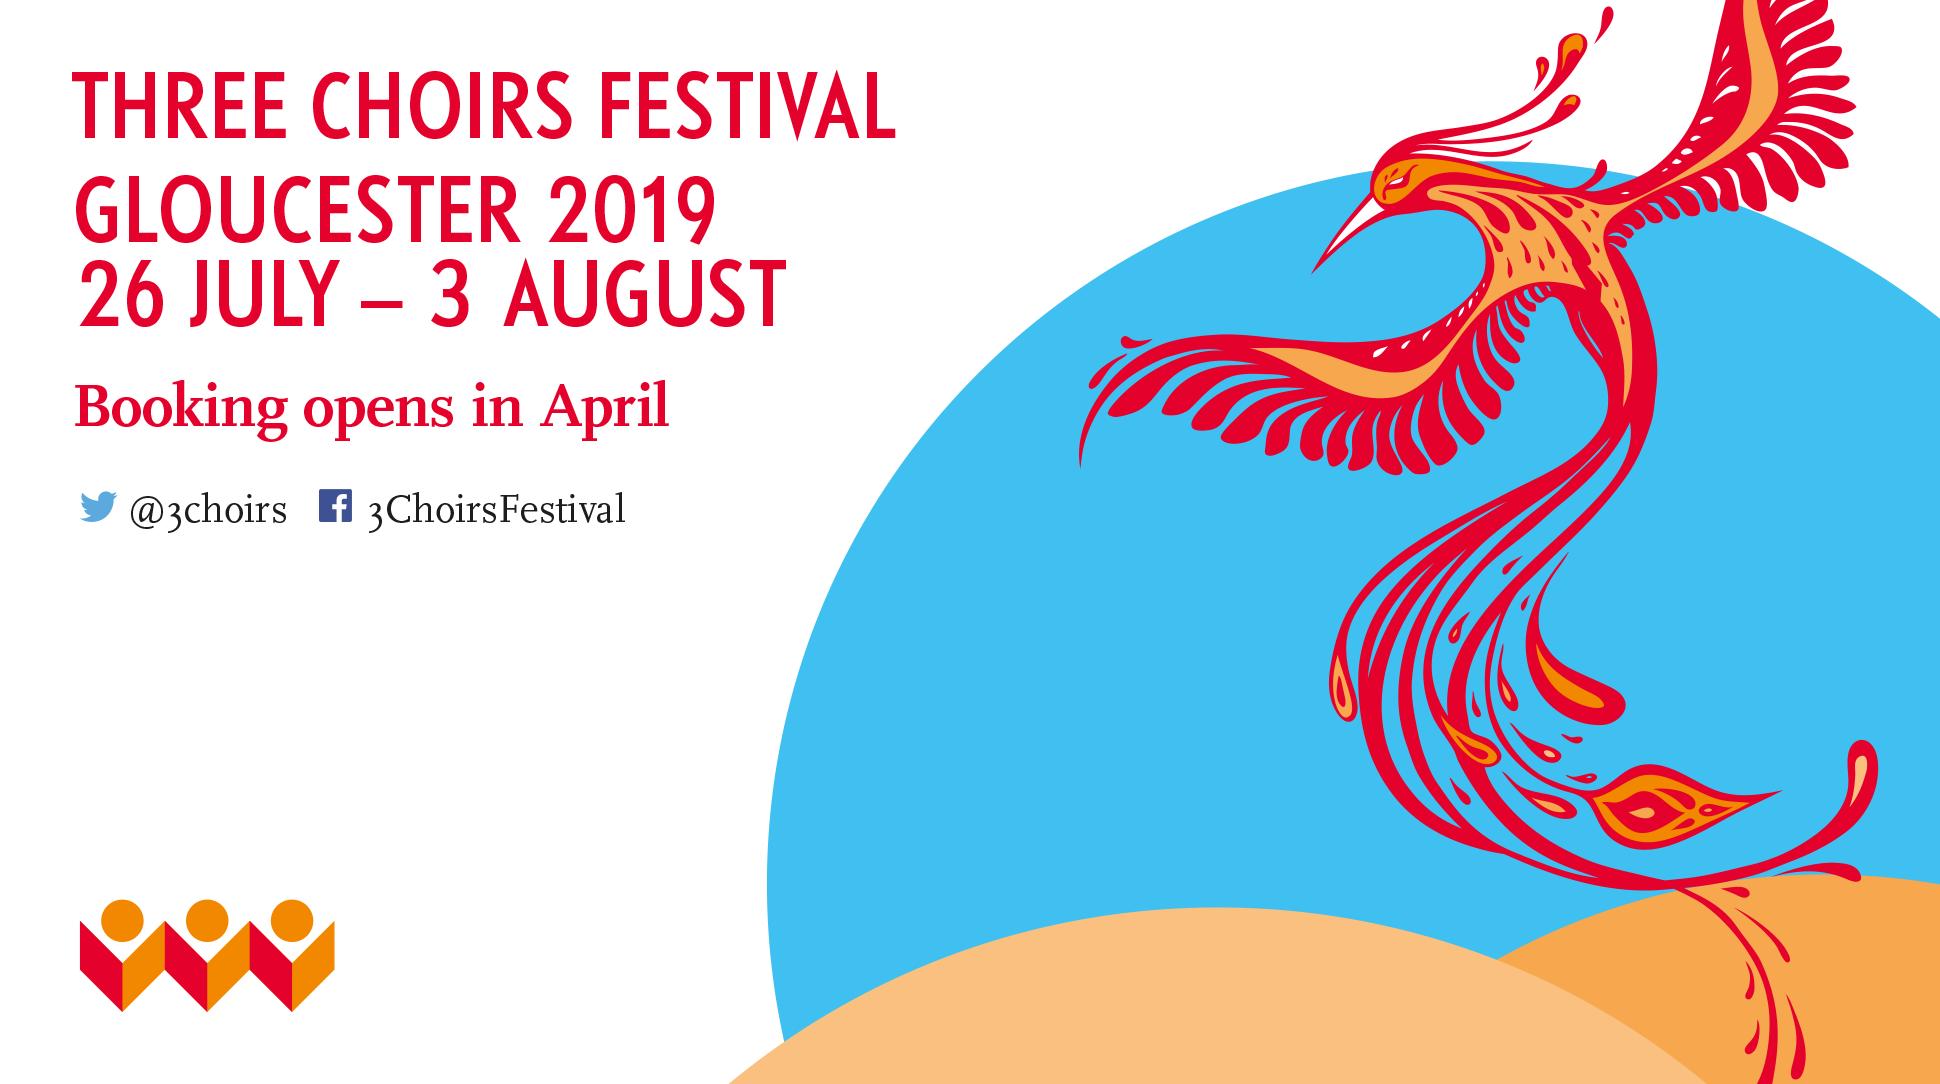 Three Choirs Festival Gloucester 2019 Programme Announced